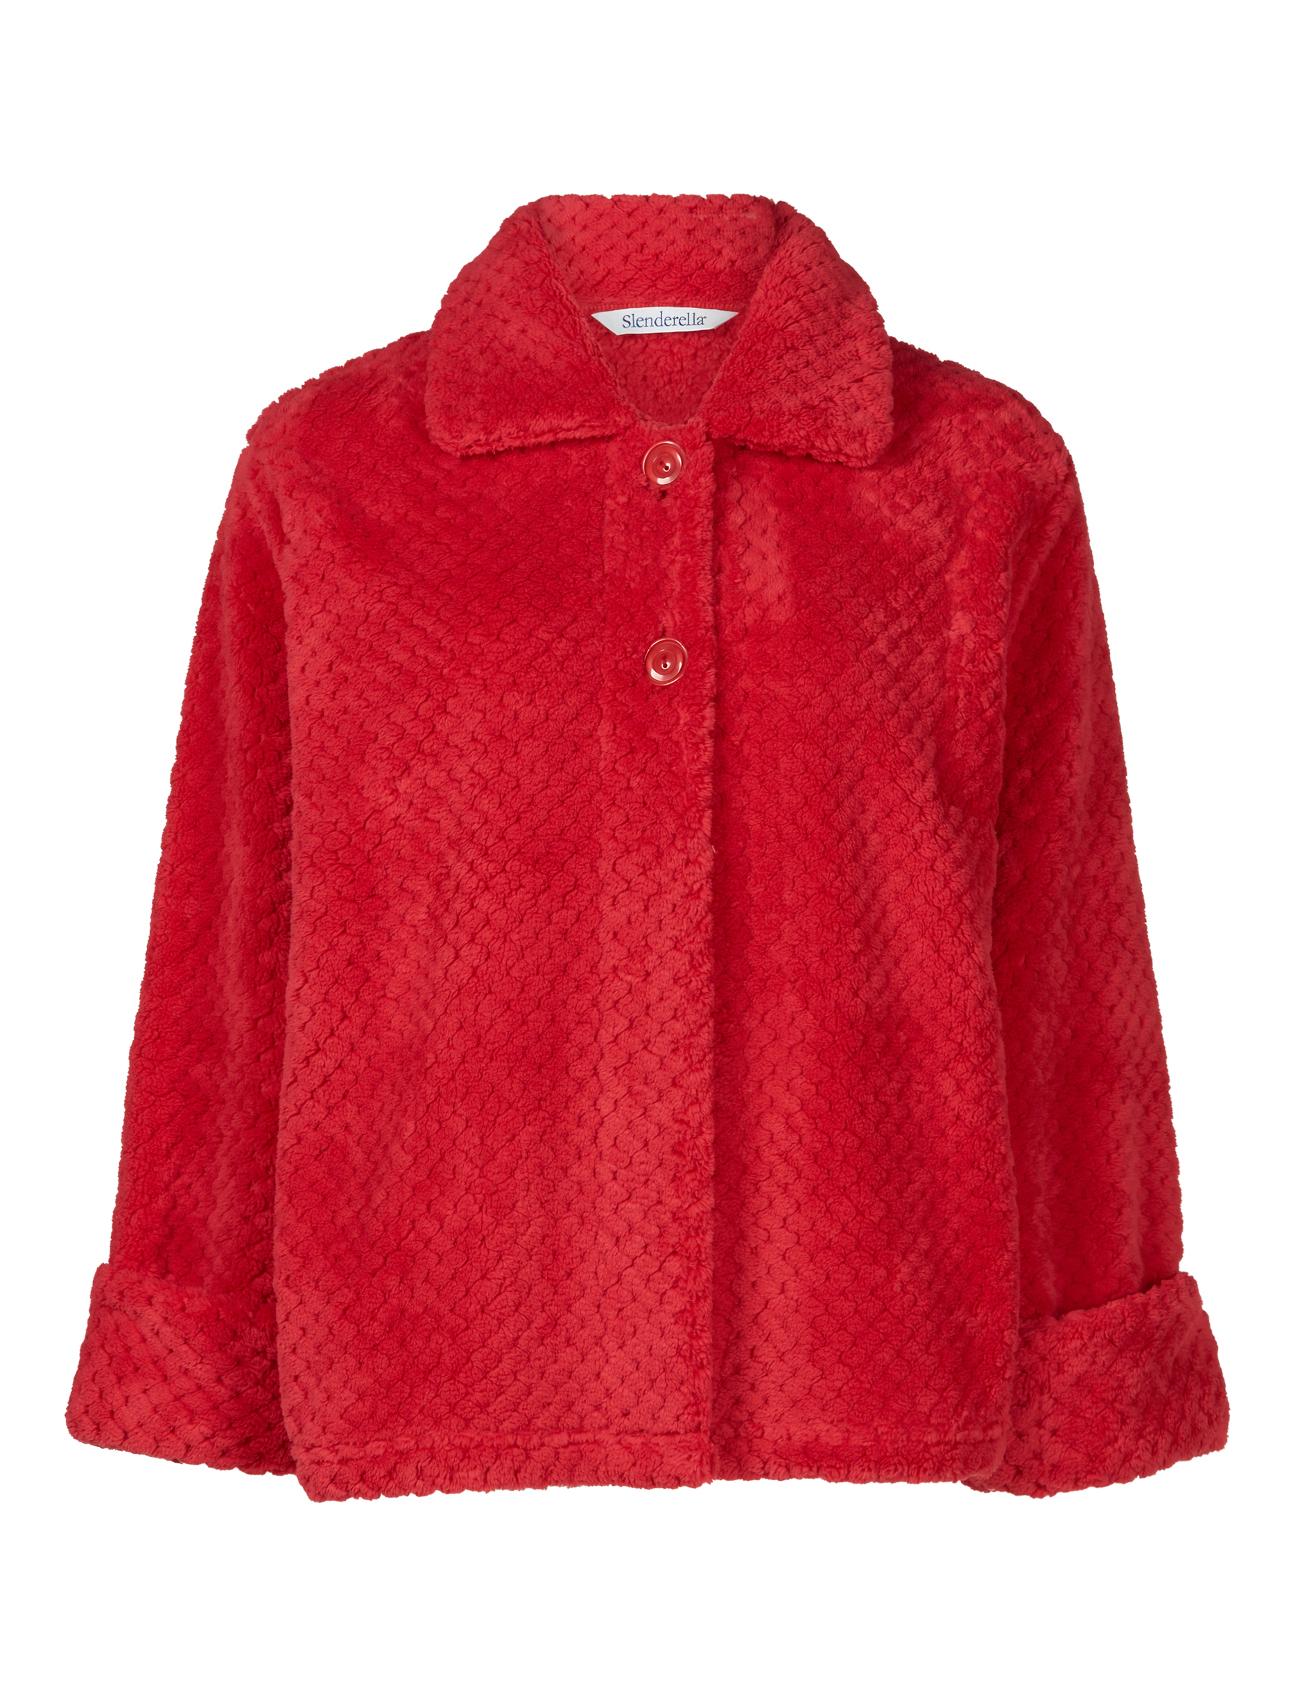 Slenderella Ladies Button Up Soft Waffle Fleece Bed Jacket